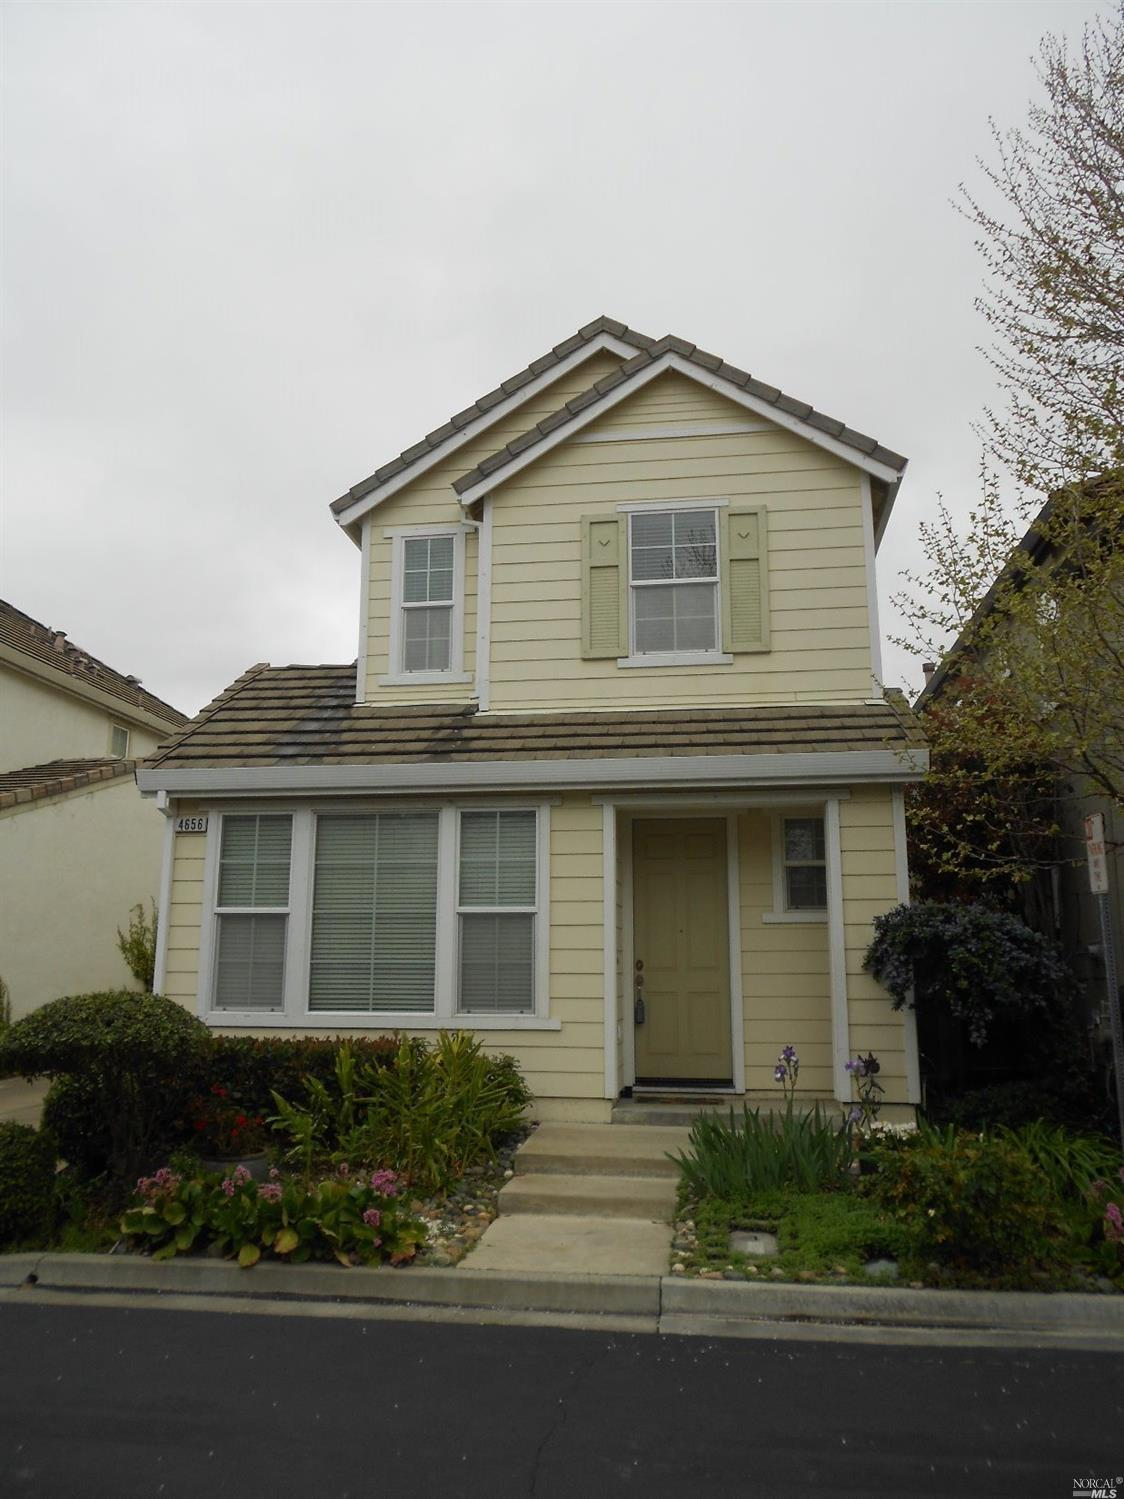 Photo of 4656 Opal Court, Fairfield, CA 94534